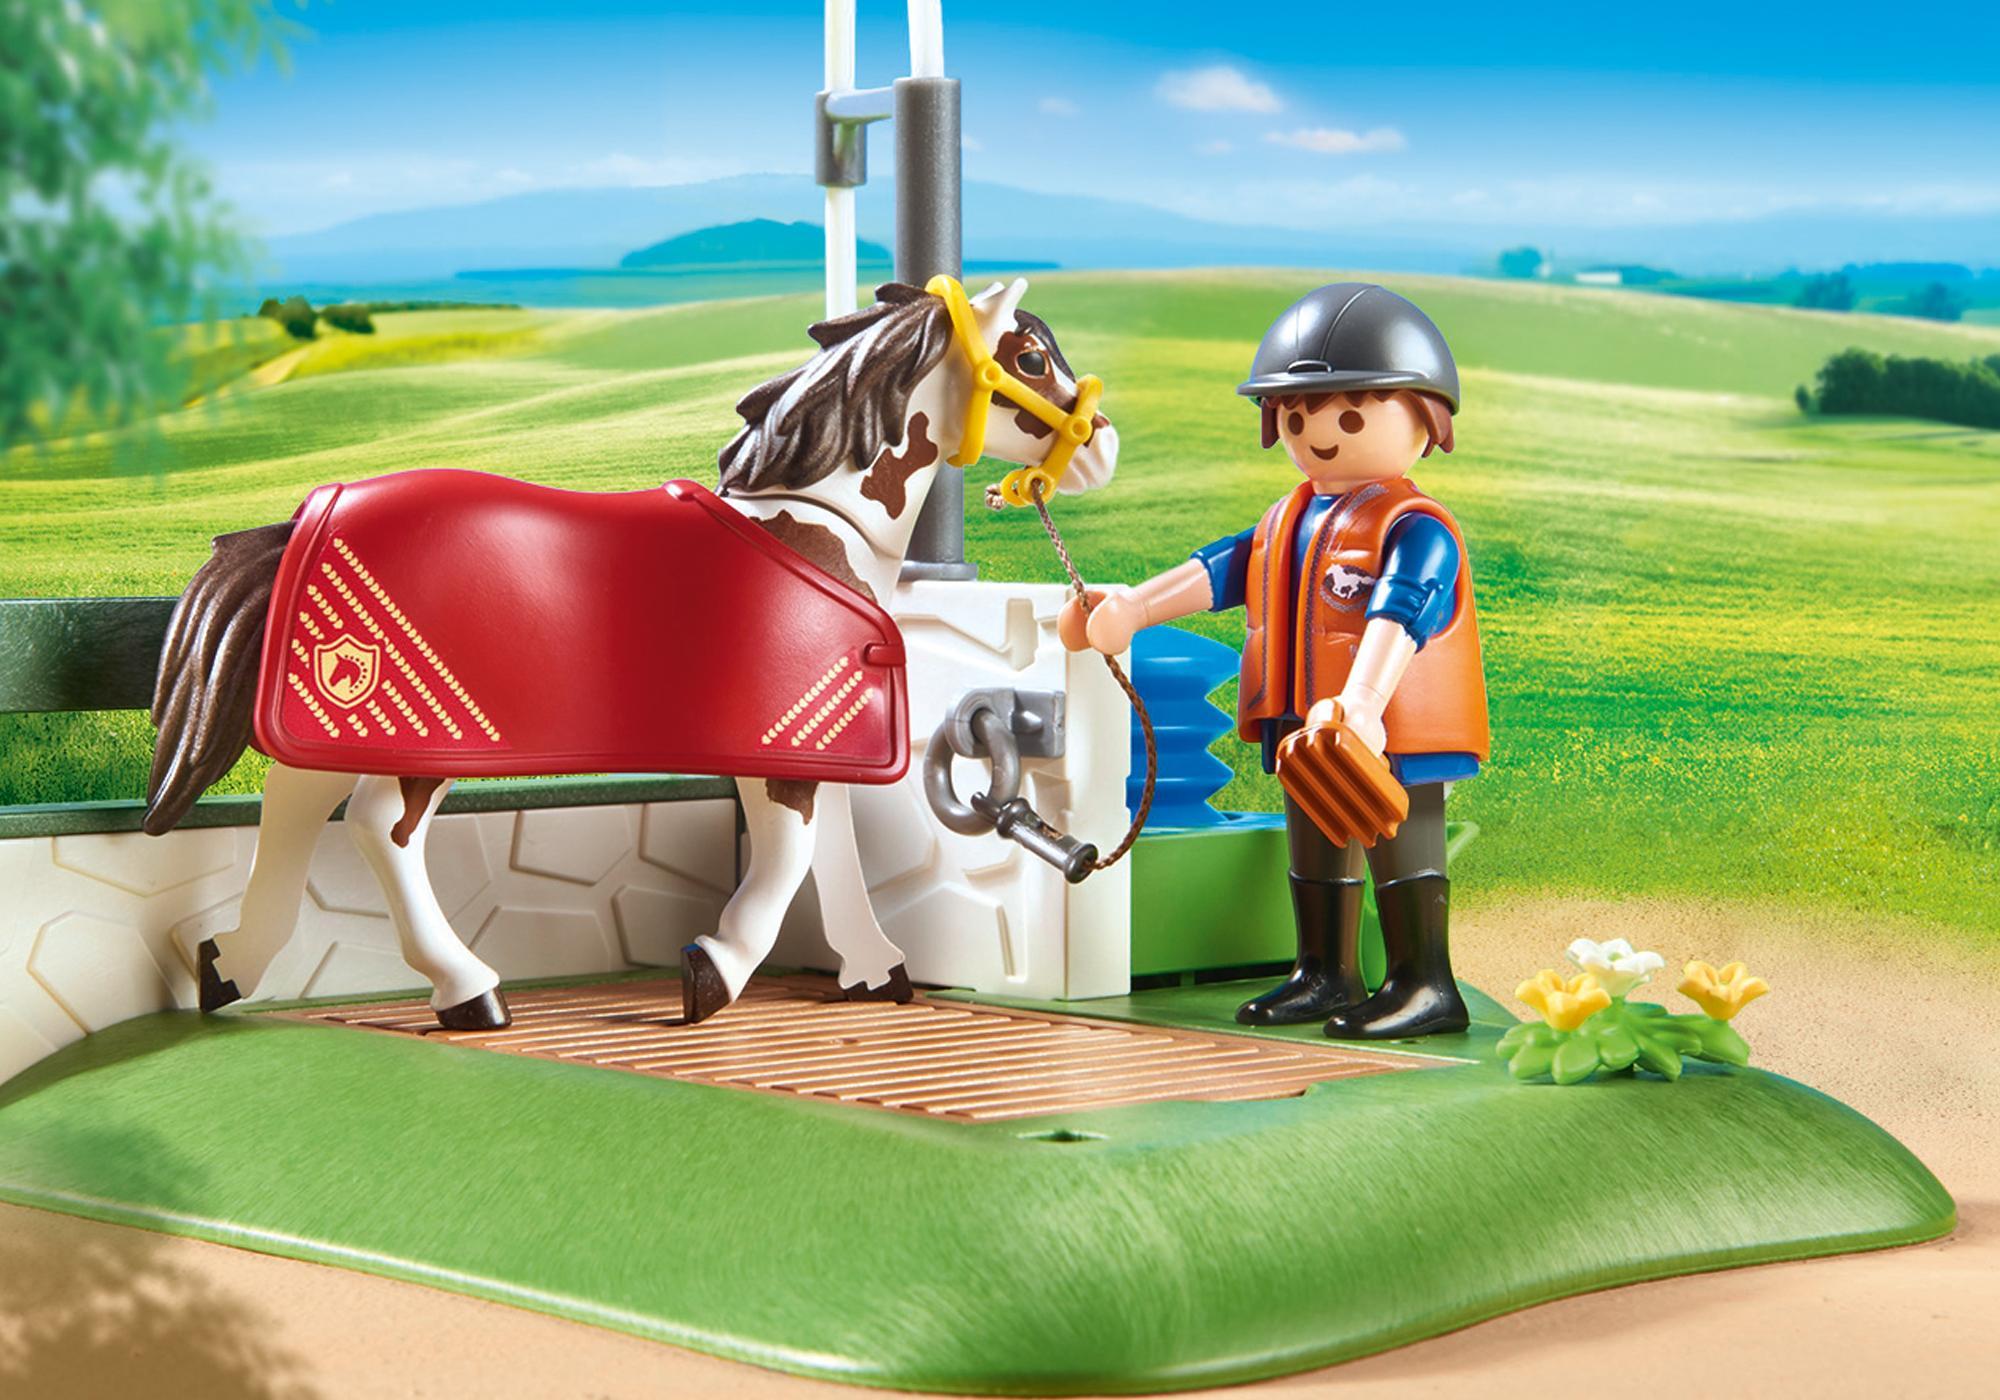 http://media.playmobil.com/i/playmobil/6929_product_extra2/Pferdewaschplatz